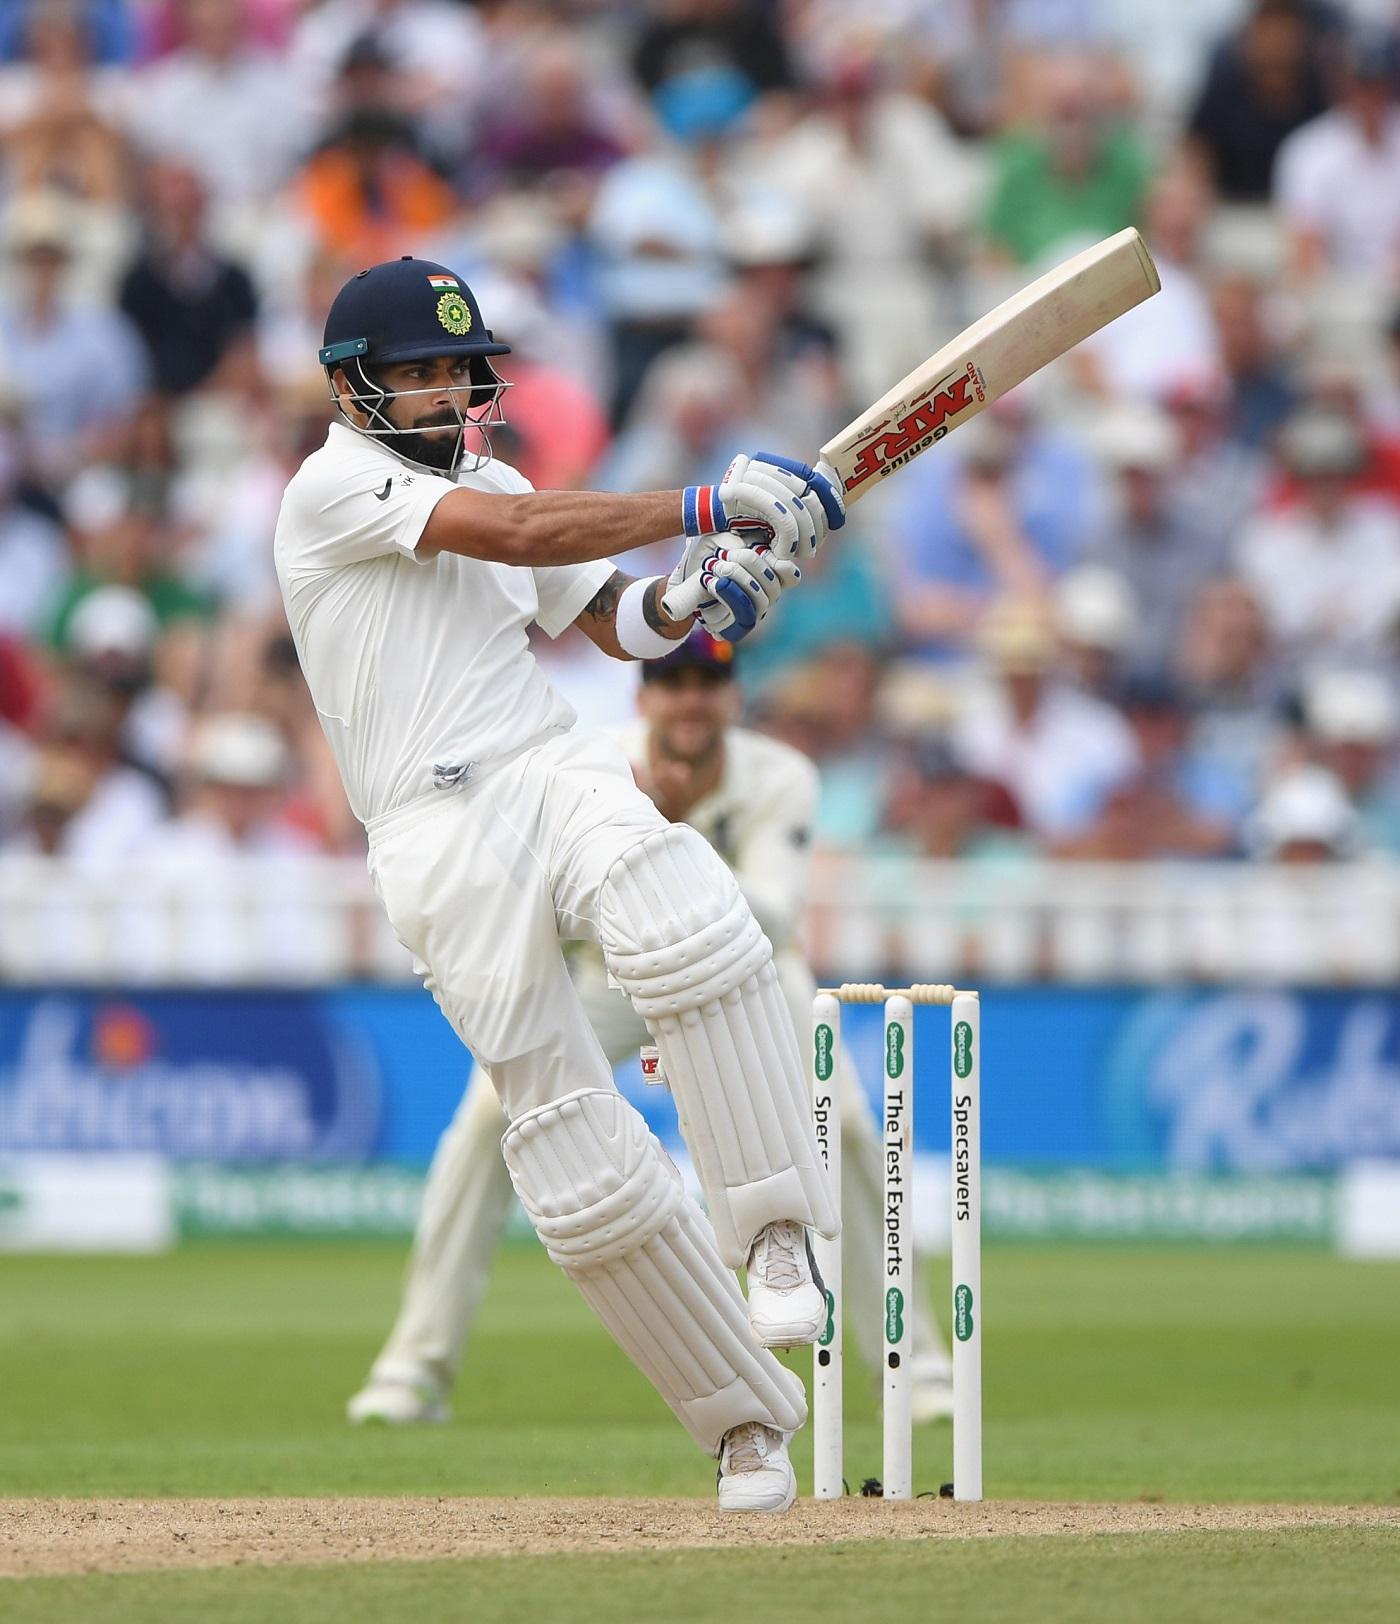 England vs India, Sunil Gavaskar, Virat Kohli